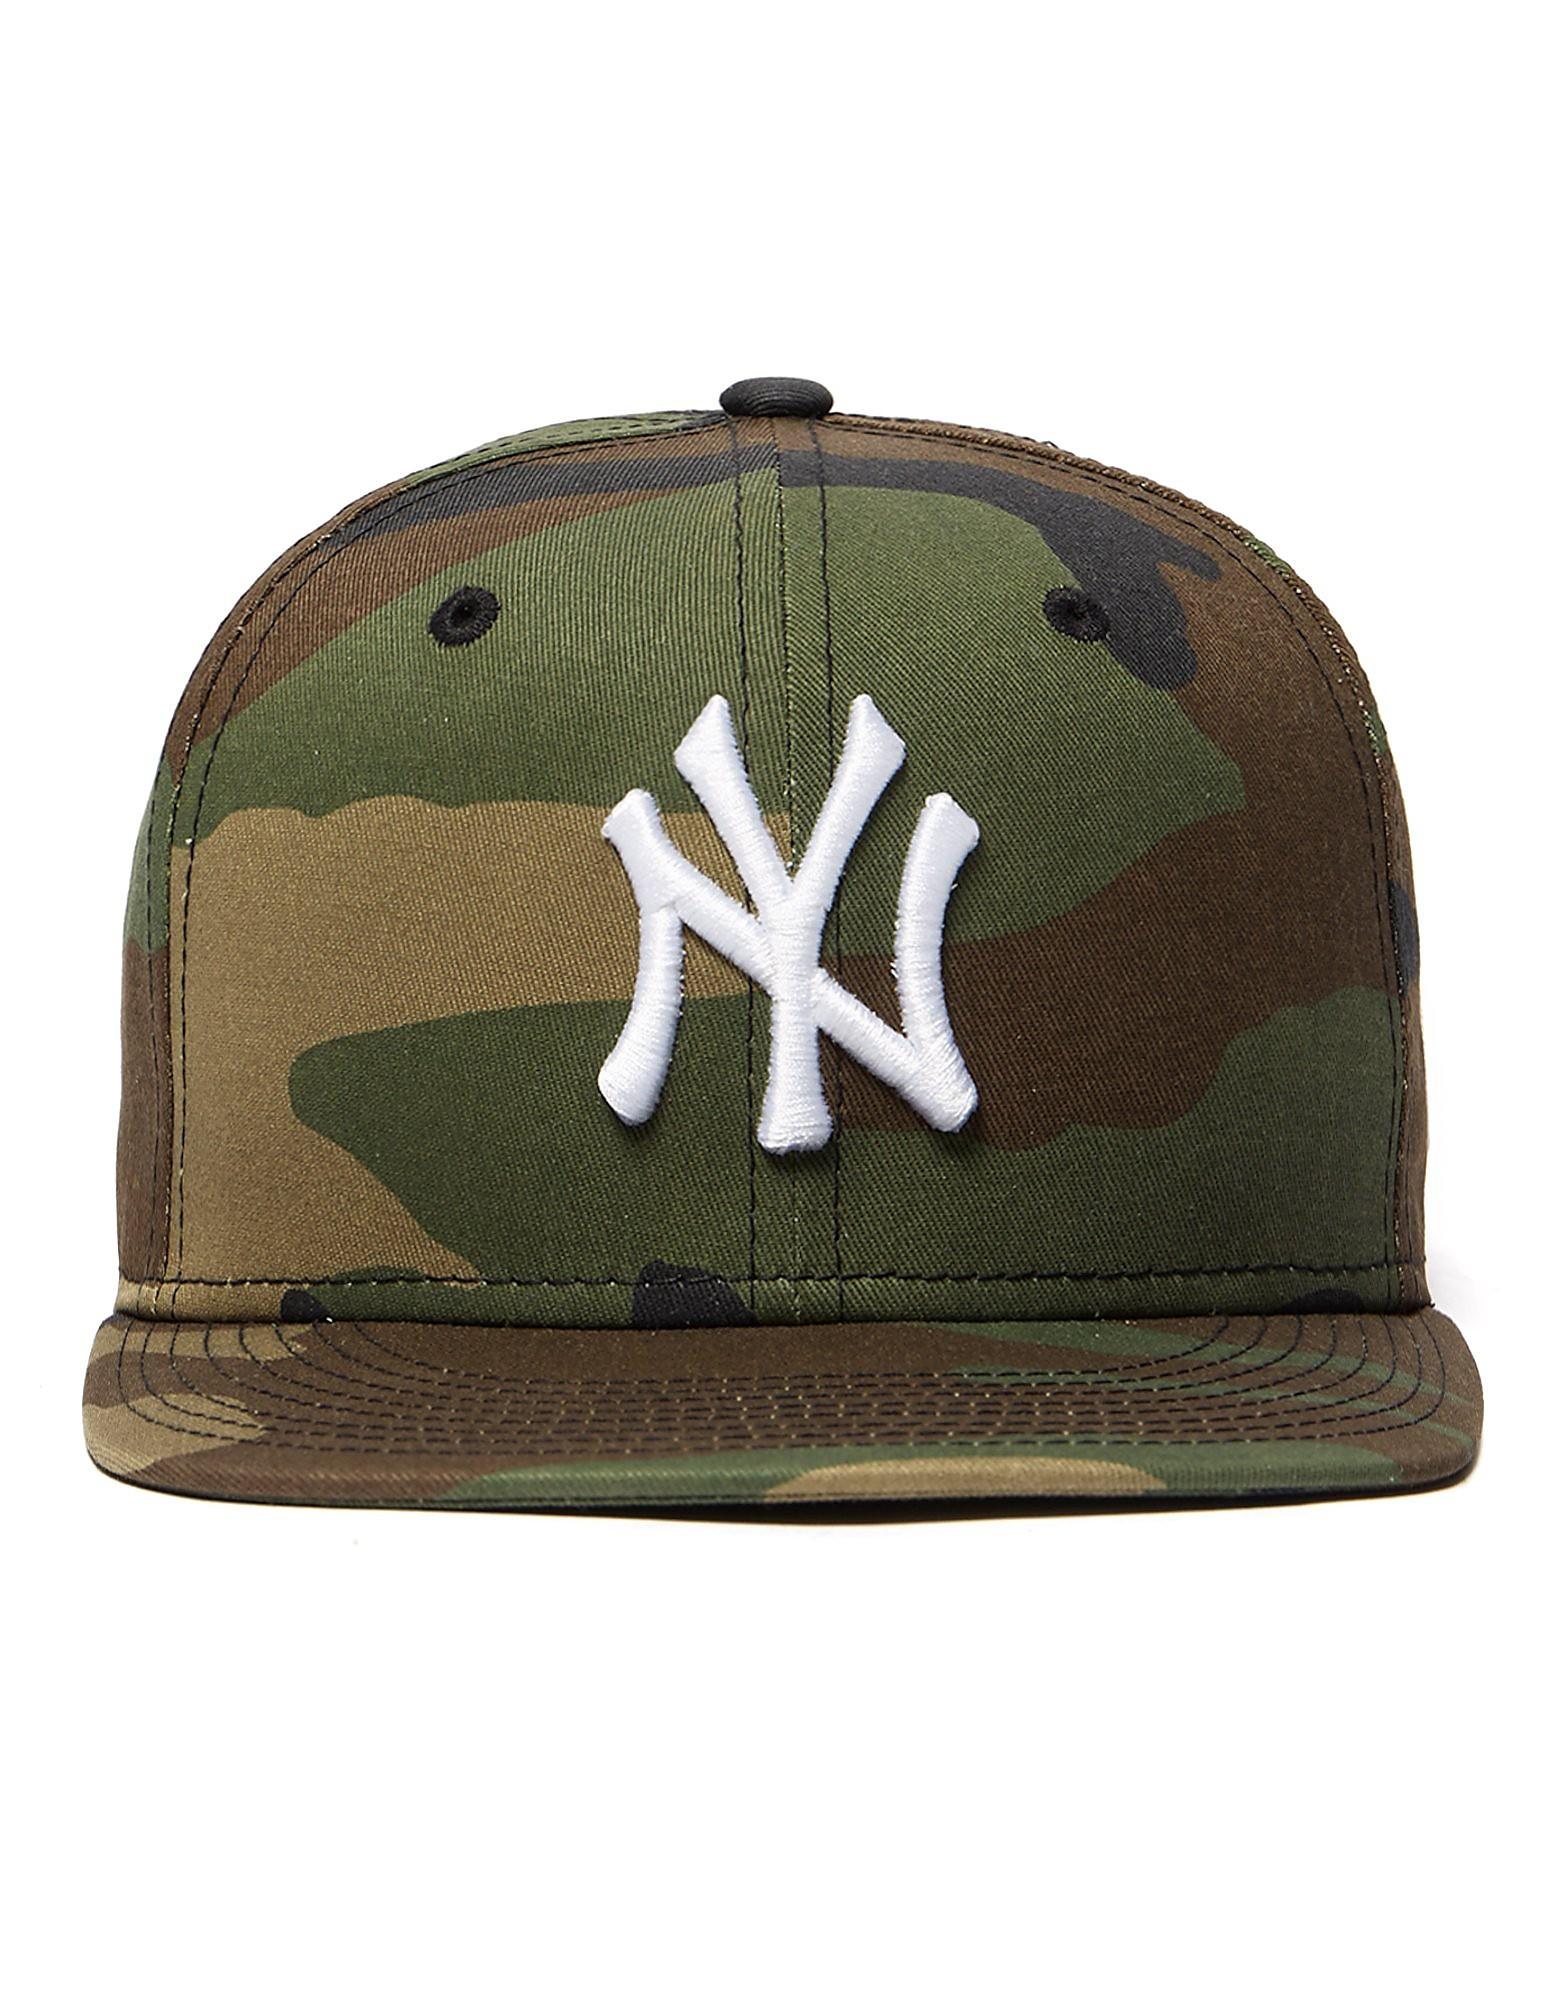 New Era 9FIFTY MLB New York Yankees Snapback Ca